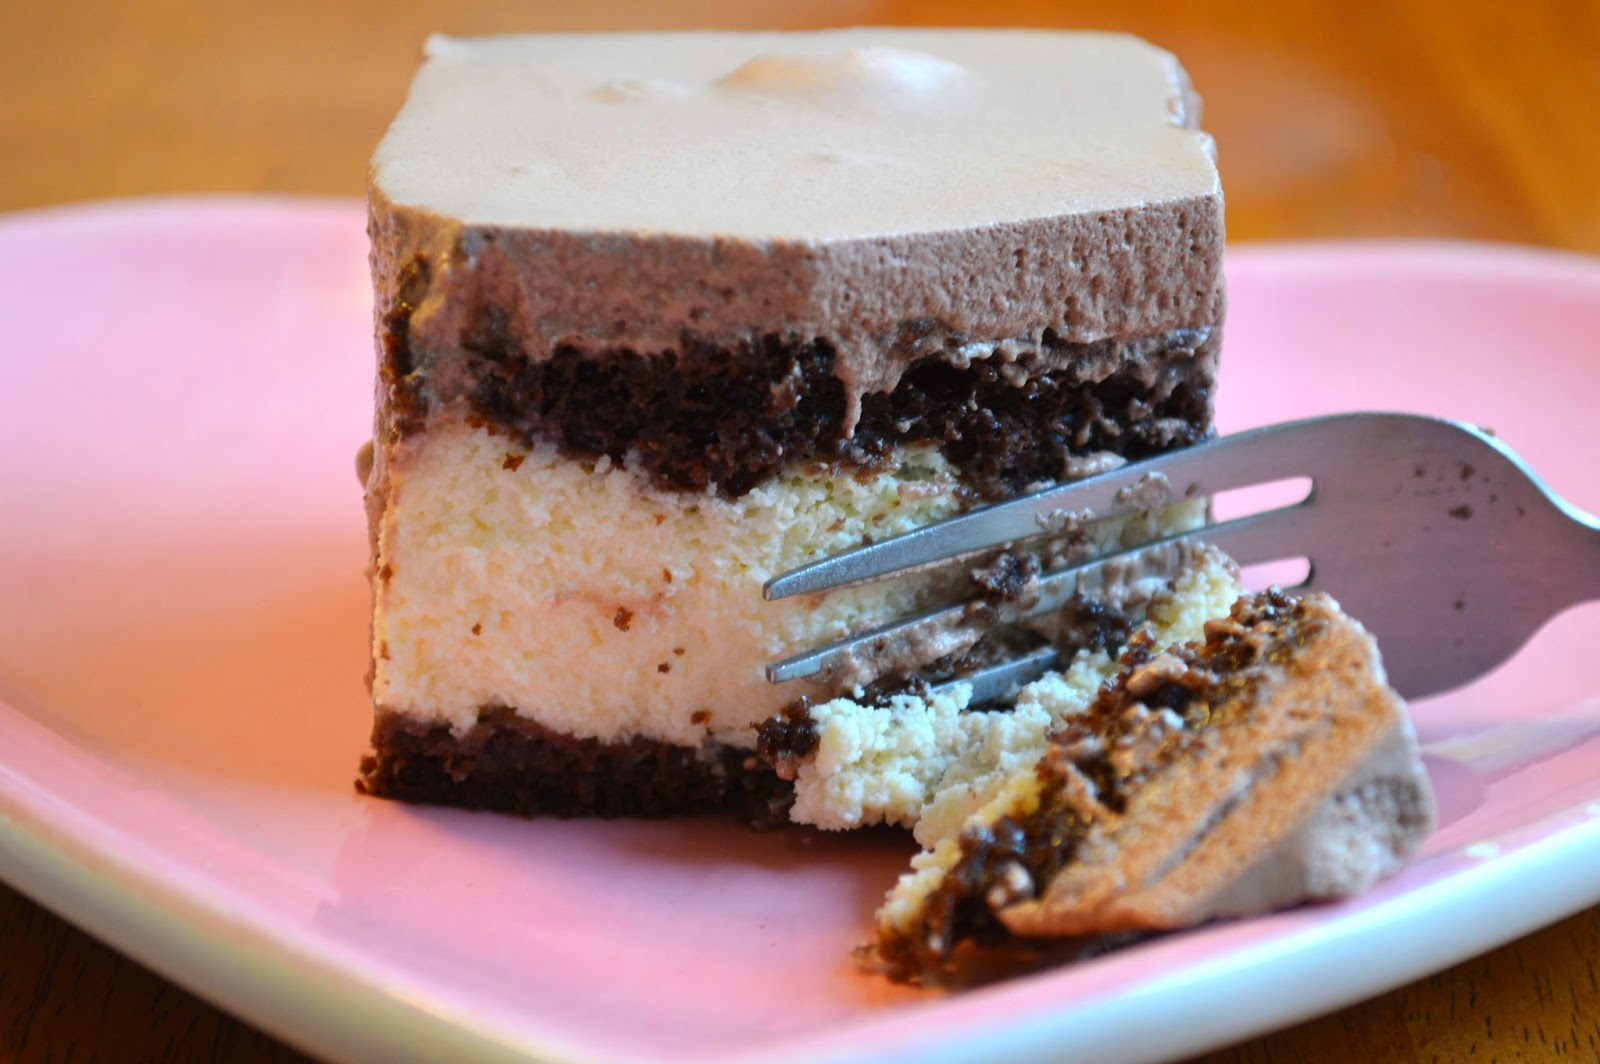 Chocolate Love Cake Images : Chocolate Italian Love Cake